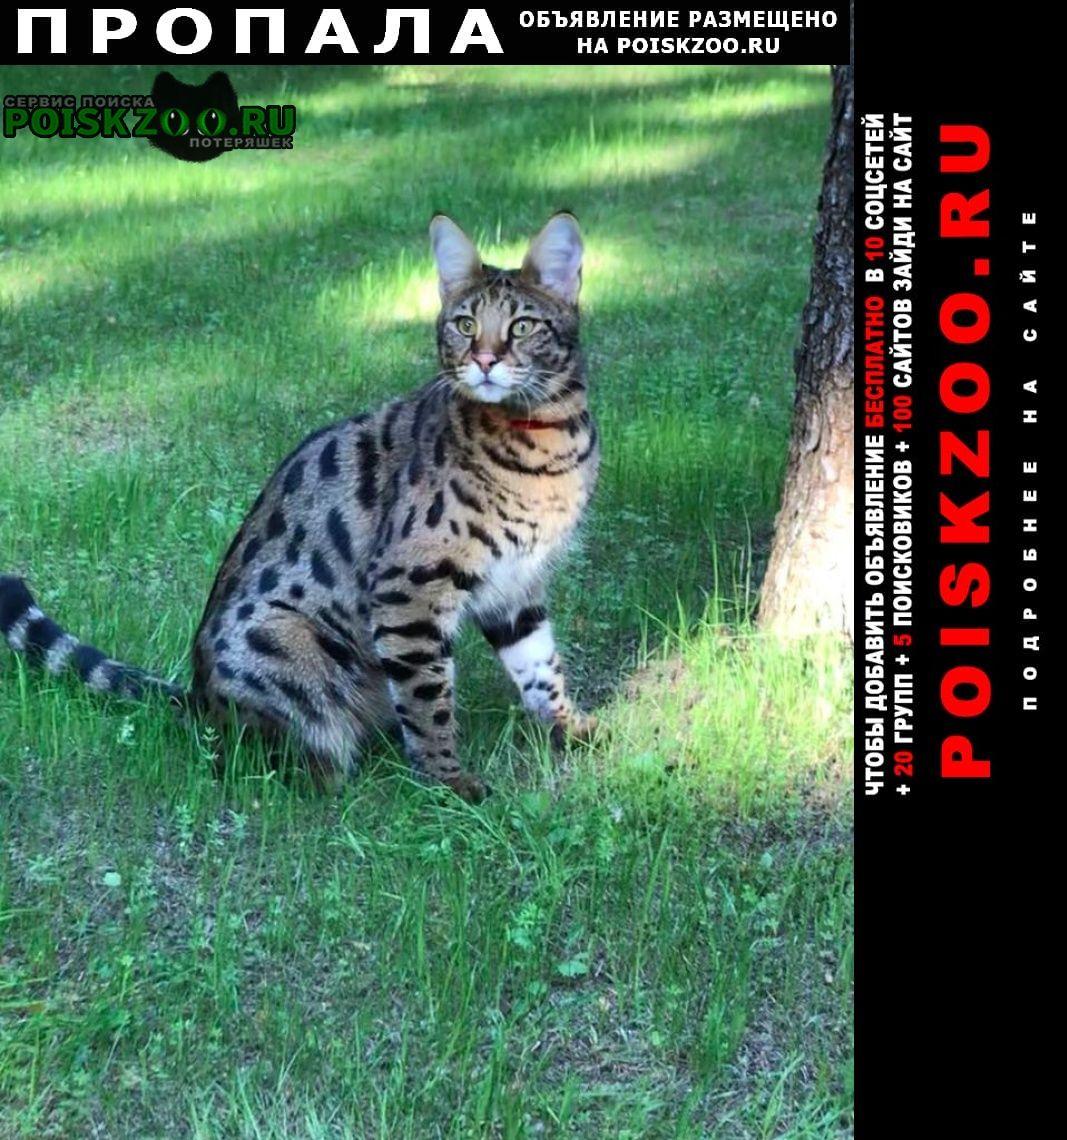 Пропала кошка 03.11 из посёлка лесные дали-м, Одинцово